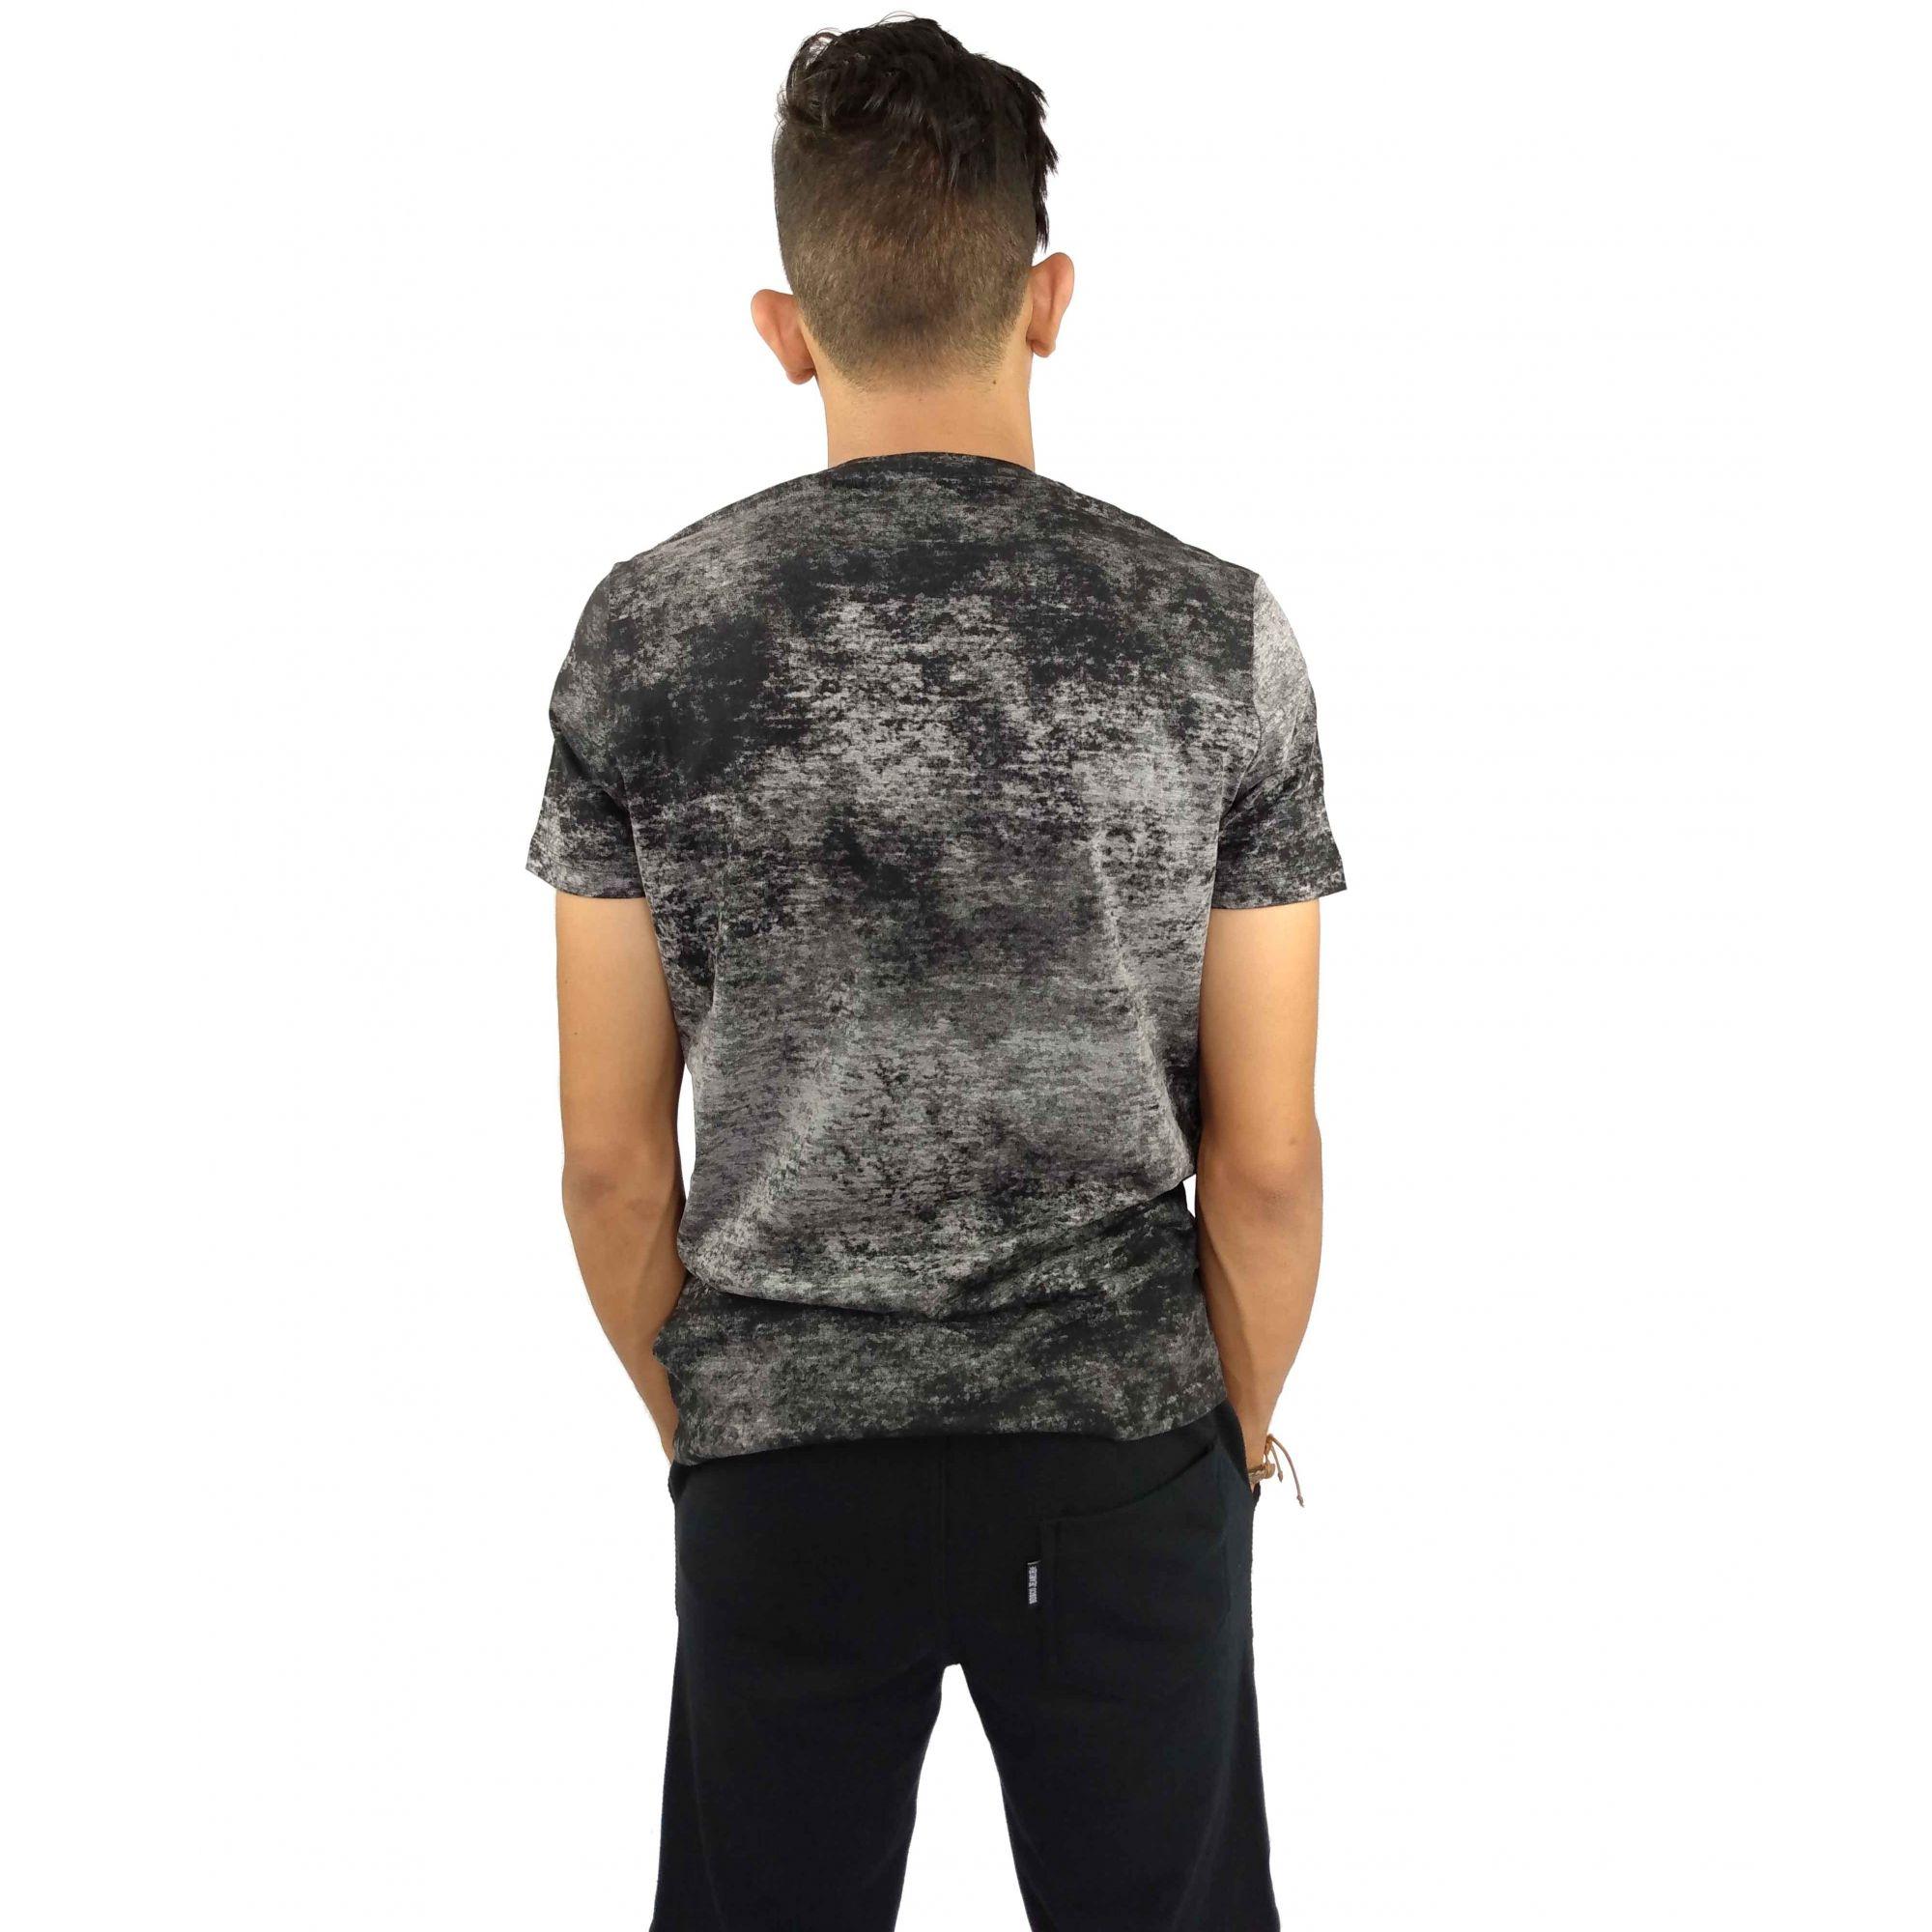 Camiseta Acostamento Masculina ACDC Cinza